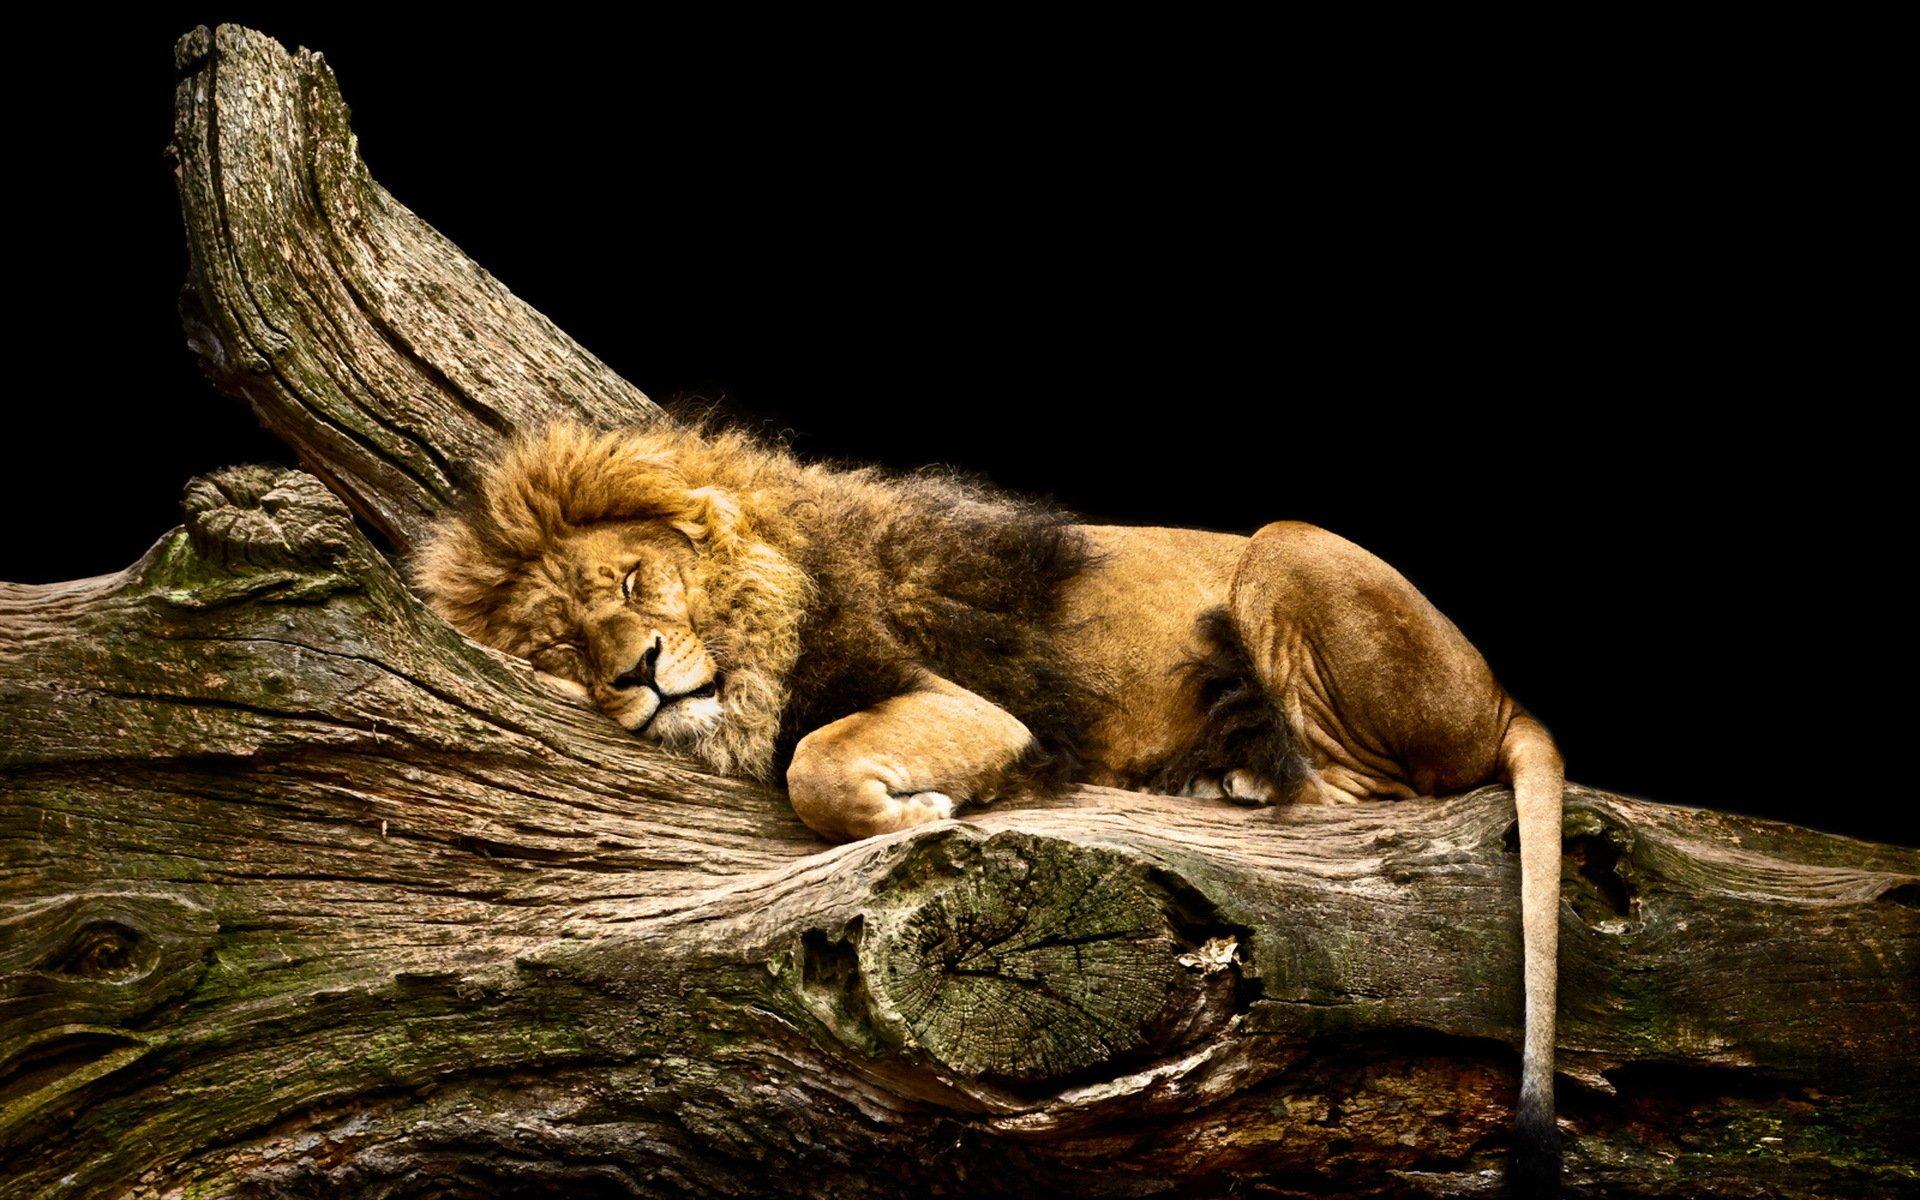 Sleeping Lion HD Wallpaper Background Image 1920x1200 ID 1920x1200